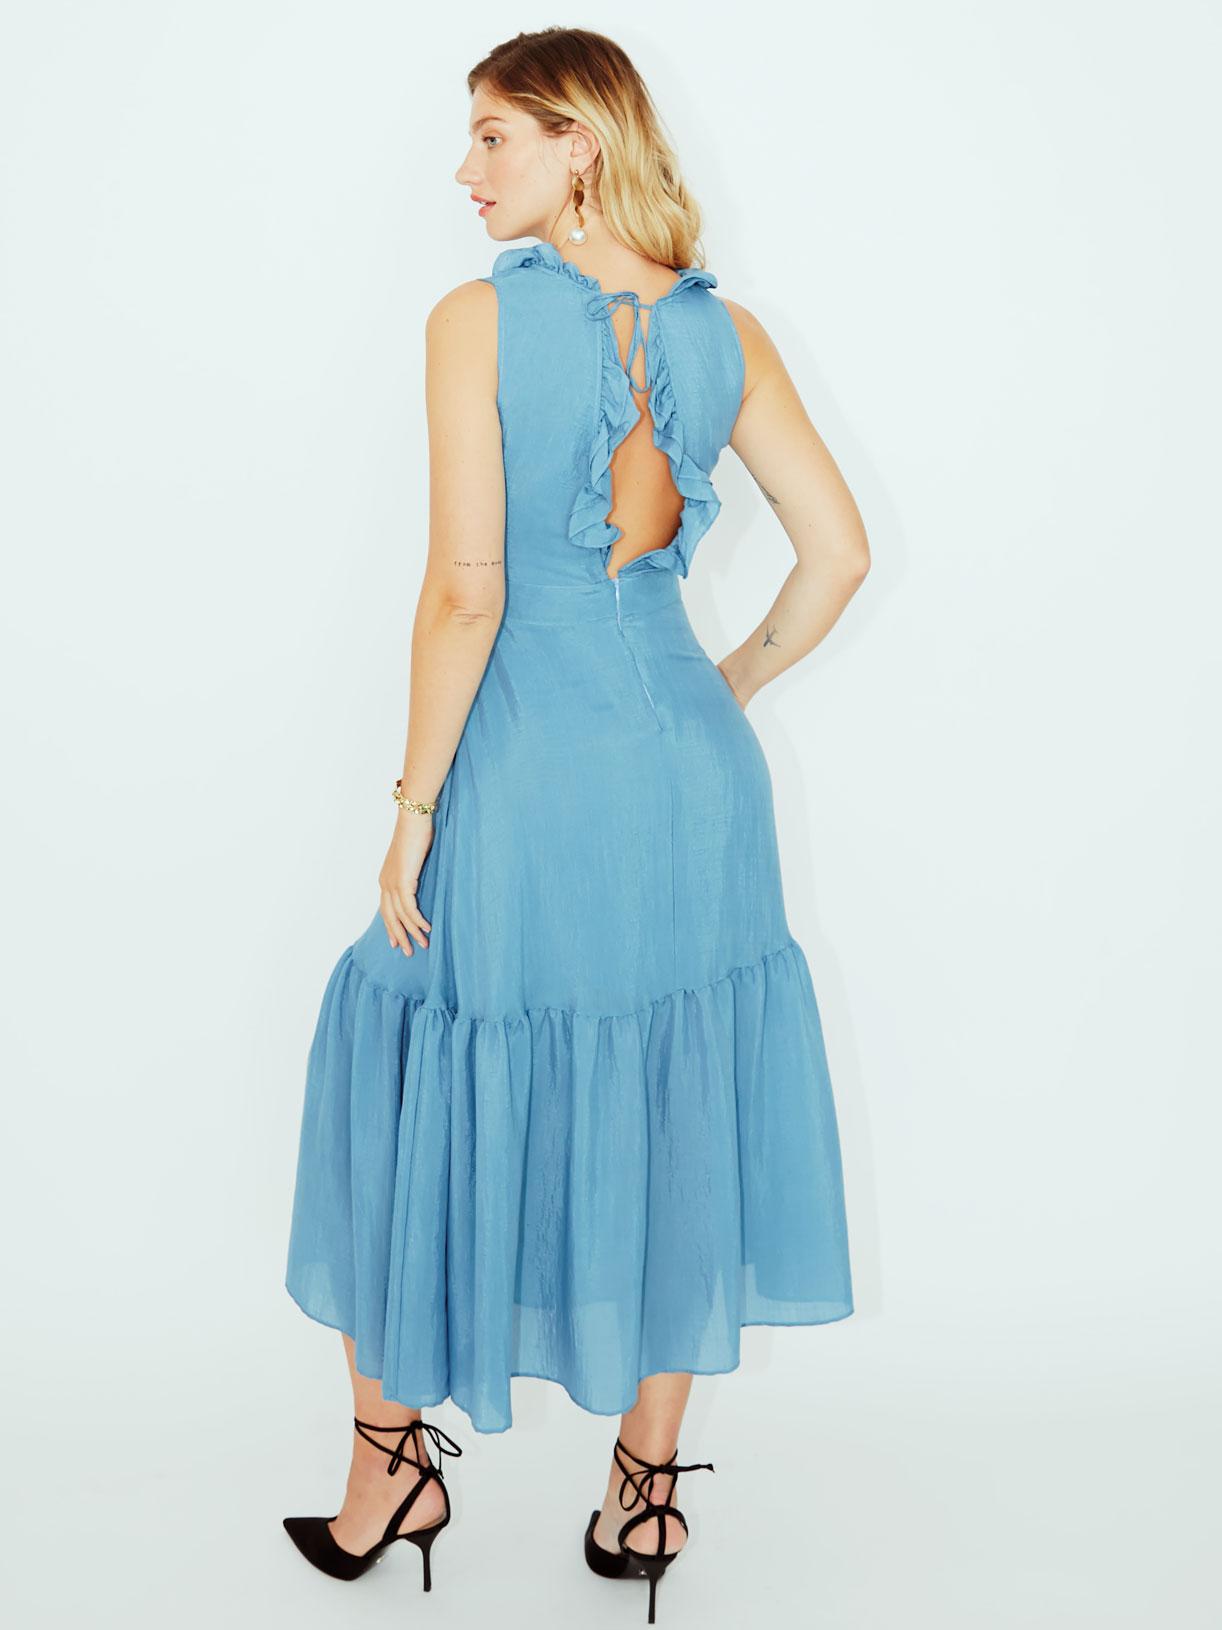 Robe longue bleue dos nu vegan pour invitee mariage ou soiree ecoresponsable - Myphilosophy